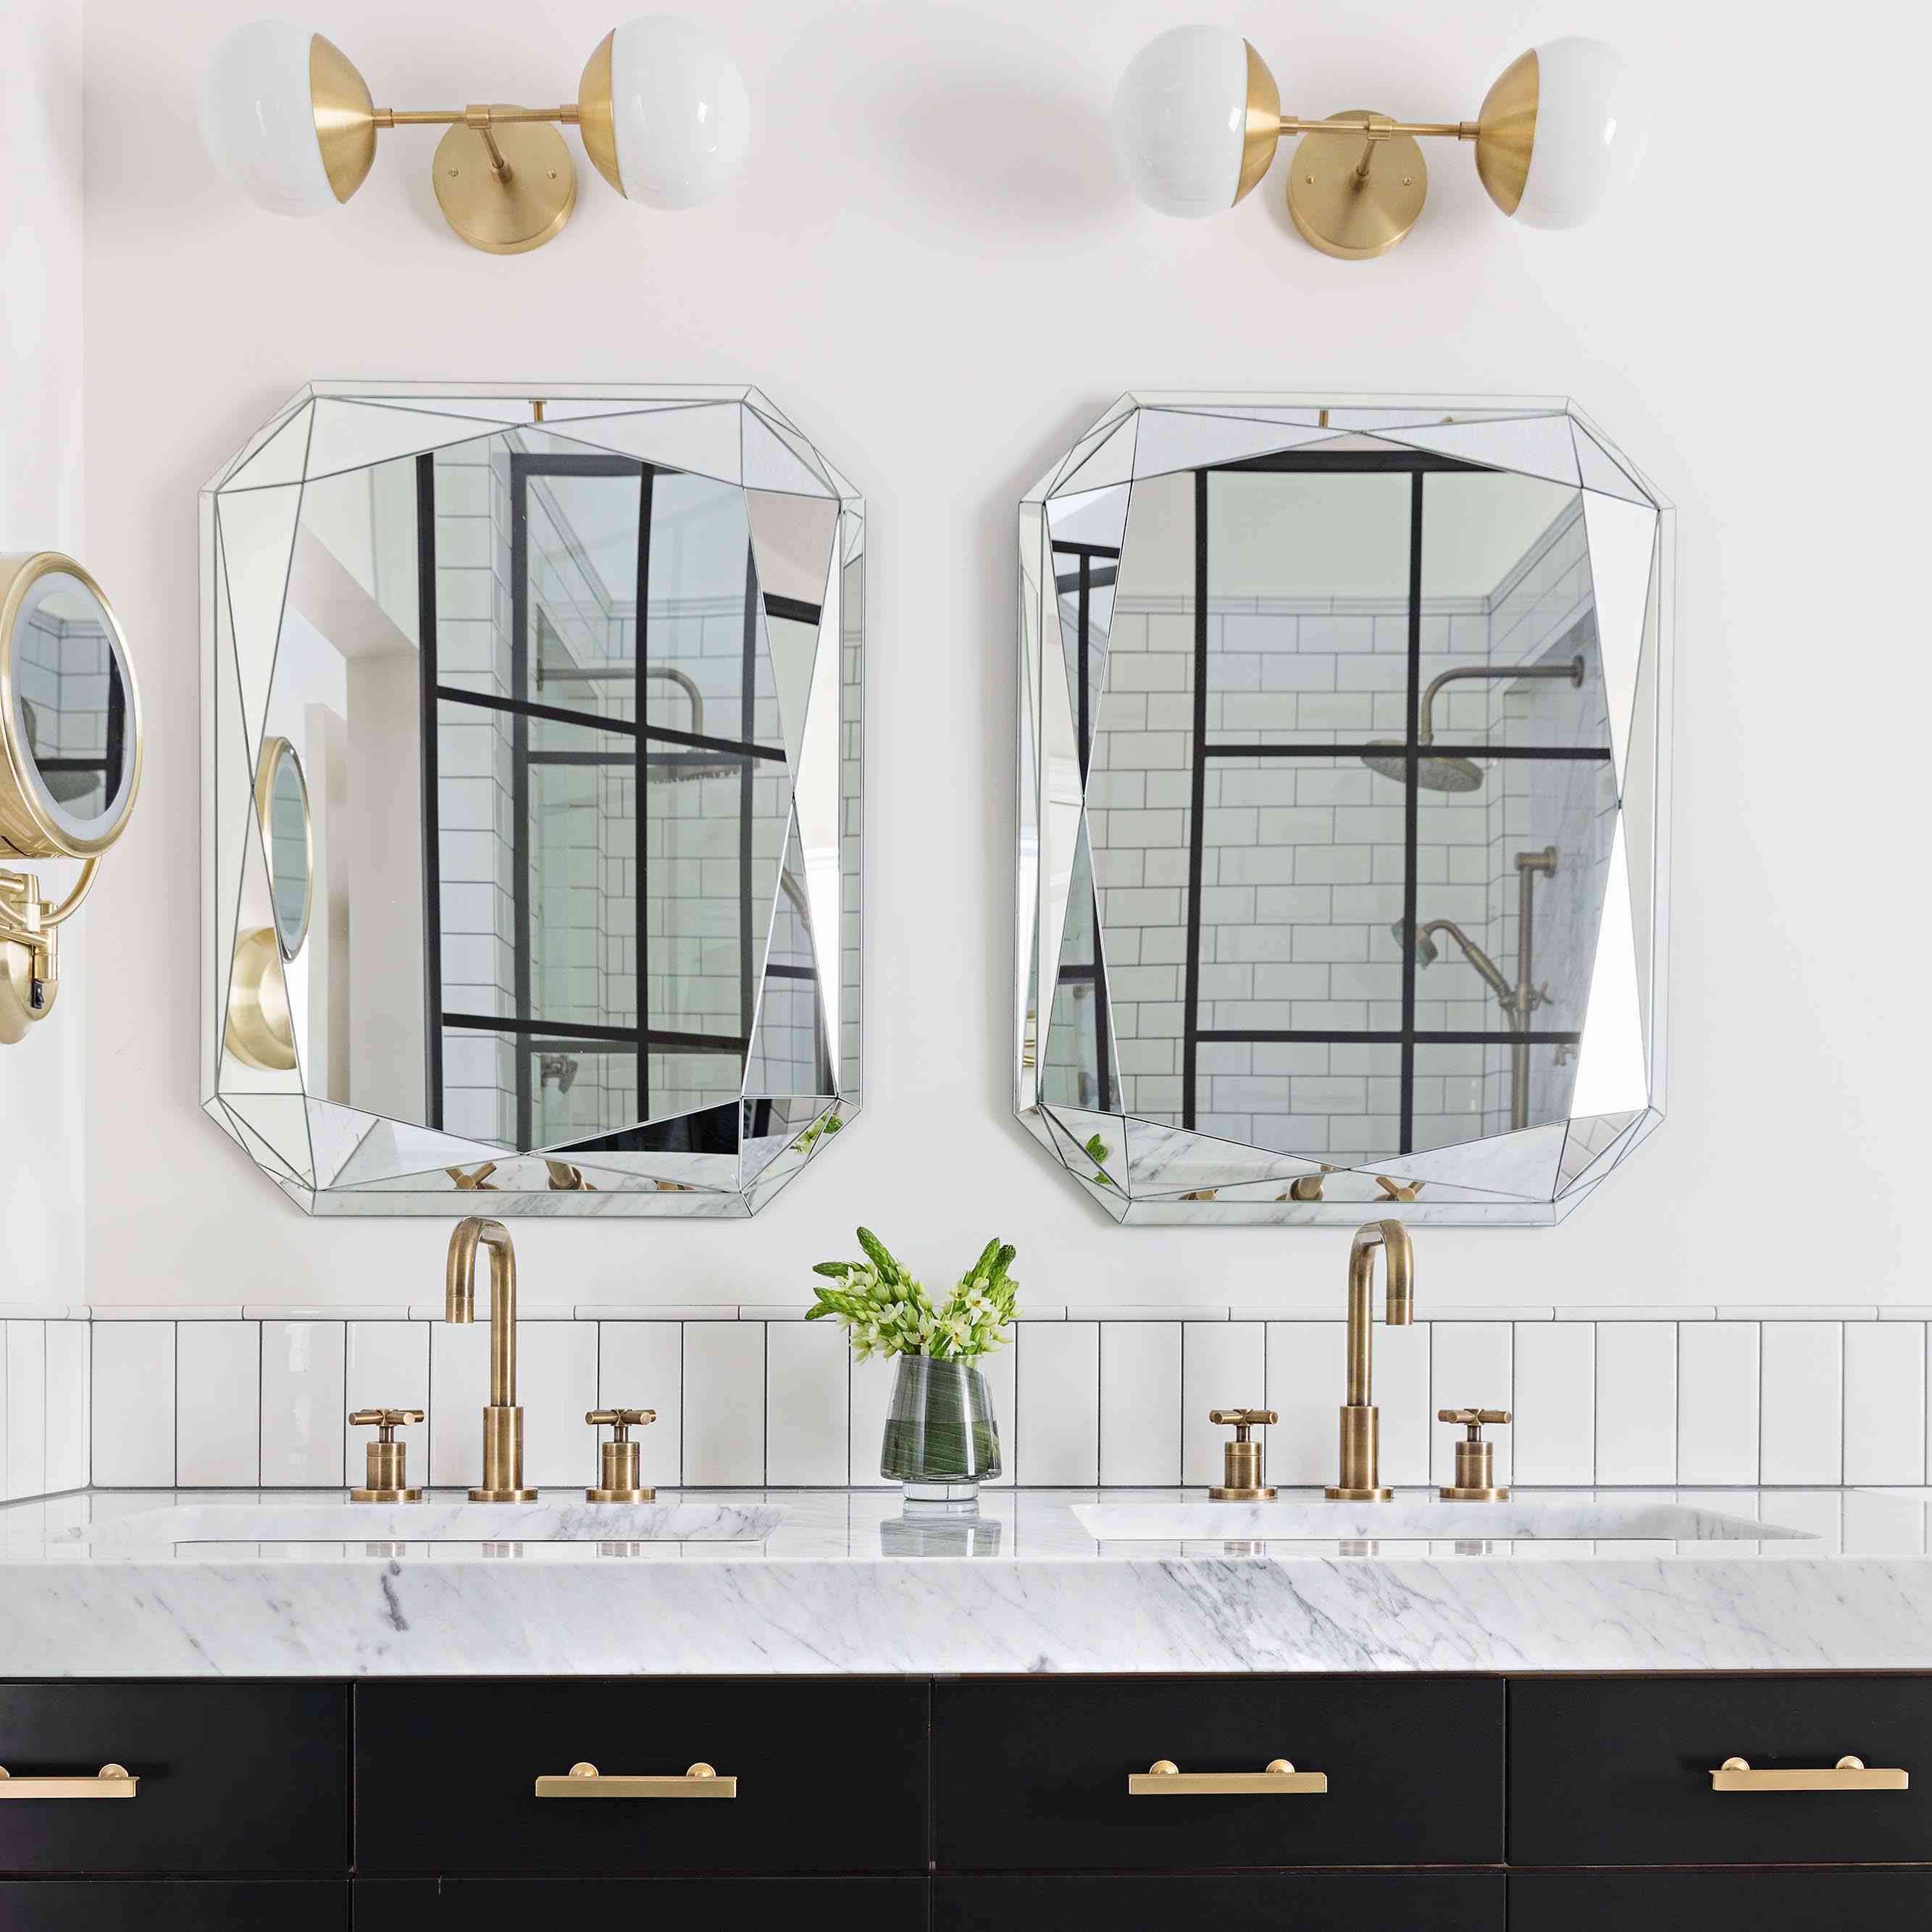 Bathroom with gold fixtures